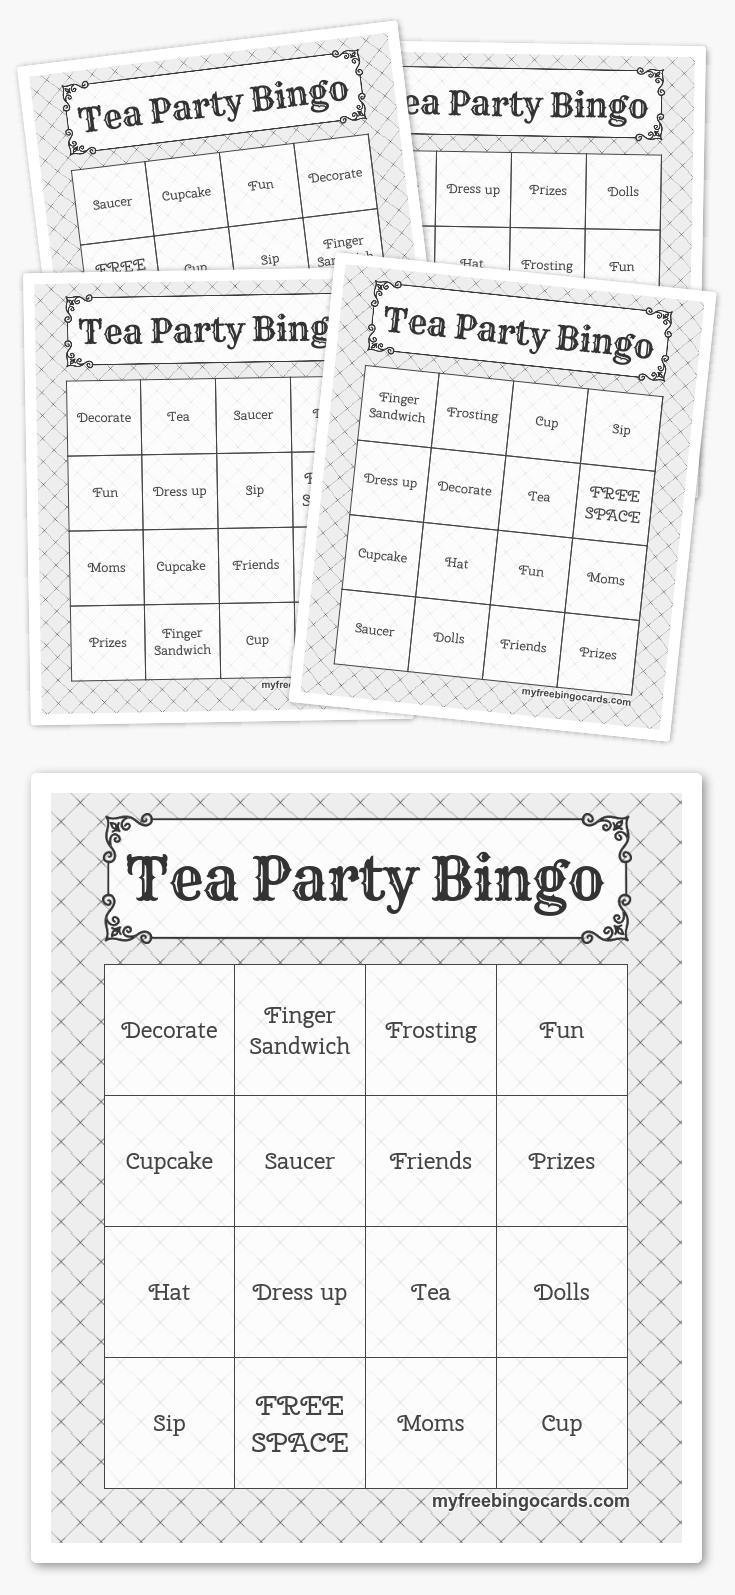 Free Printable Bingo Cards In 2019 | Printables | Pinterest | Harry - Free Printable Bingo Cards